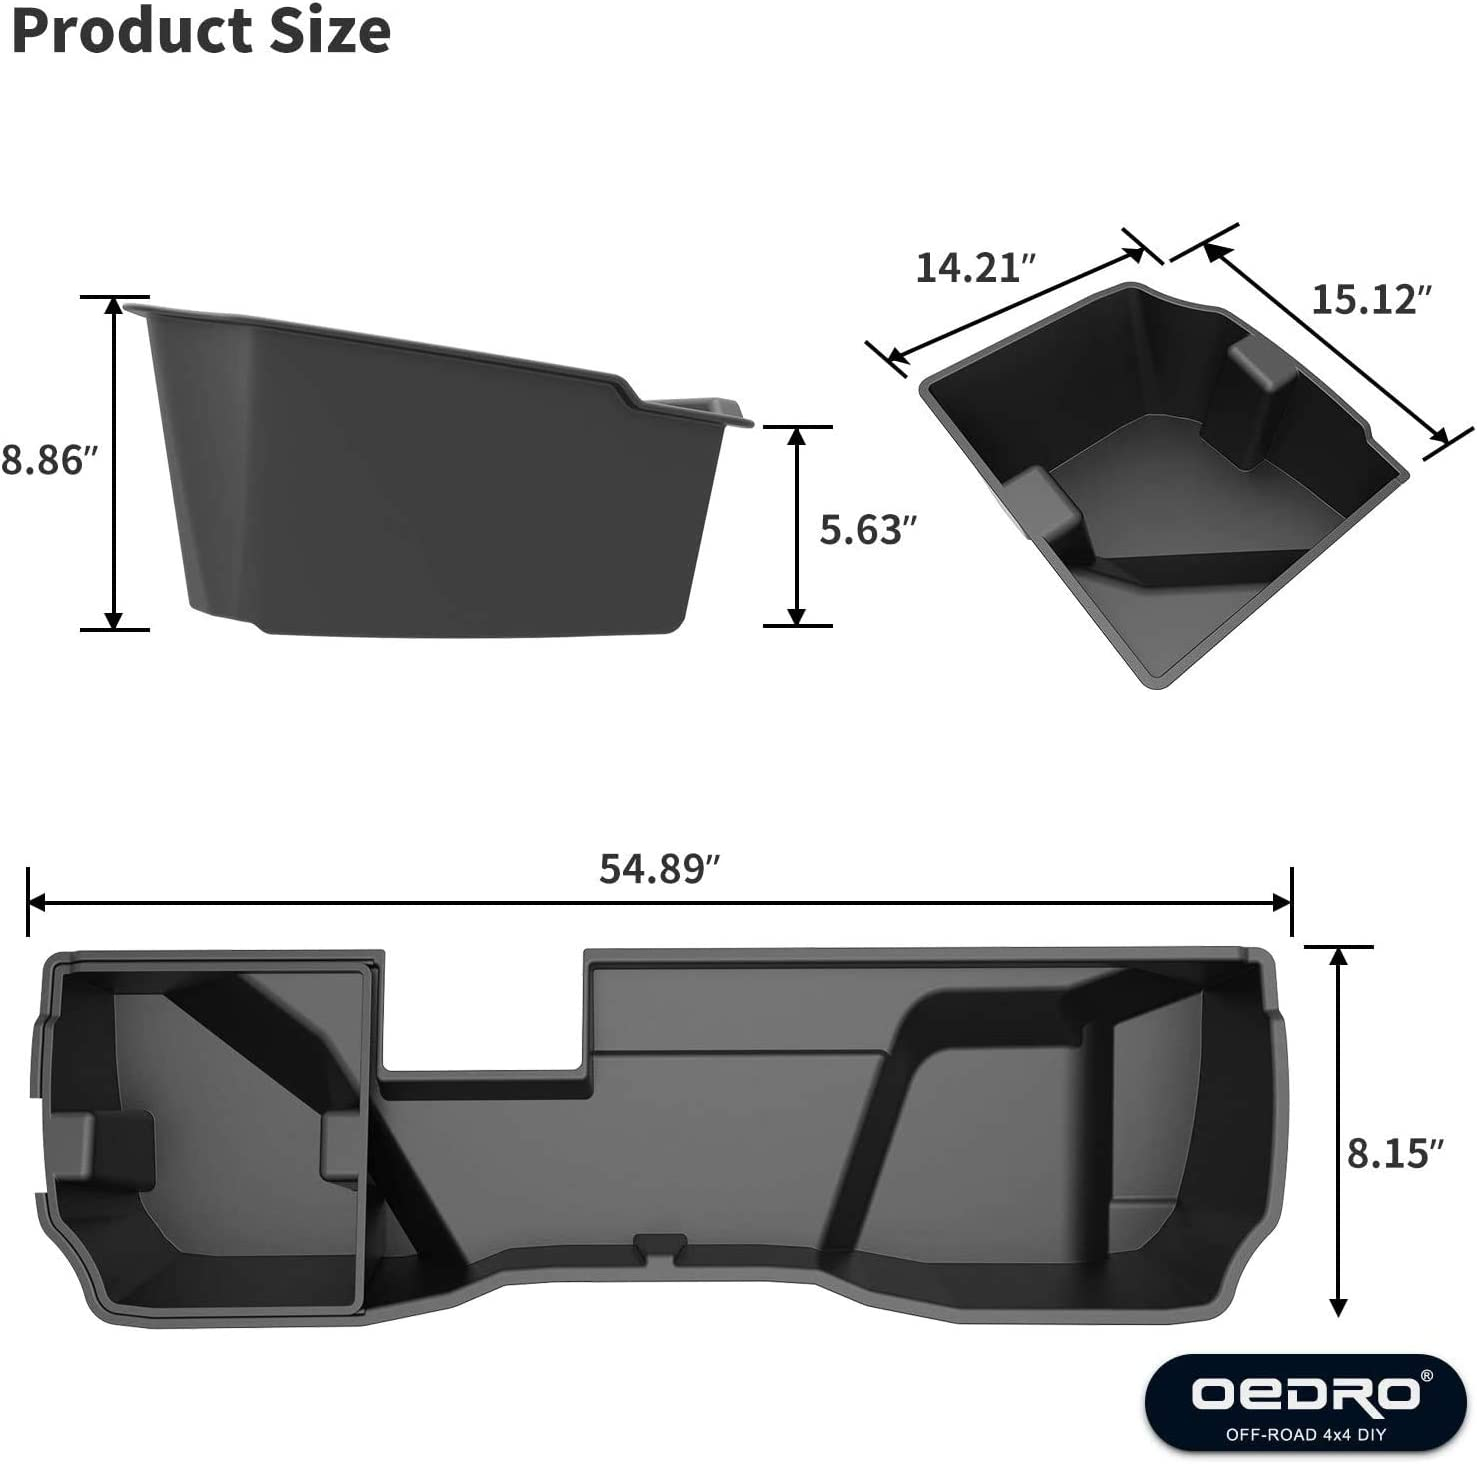 2019 LD ONLY oEdRo Upgraded Under Seat Storage Box Compatible for 2014-2018 Chevrolet Silverado//GMC Sierra 1500 Double Cab 2015-2018 Silverado//Sierra 2500 3500 HD /& Car Trunk Organizer with Removab